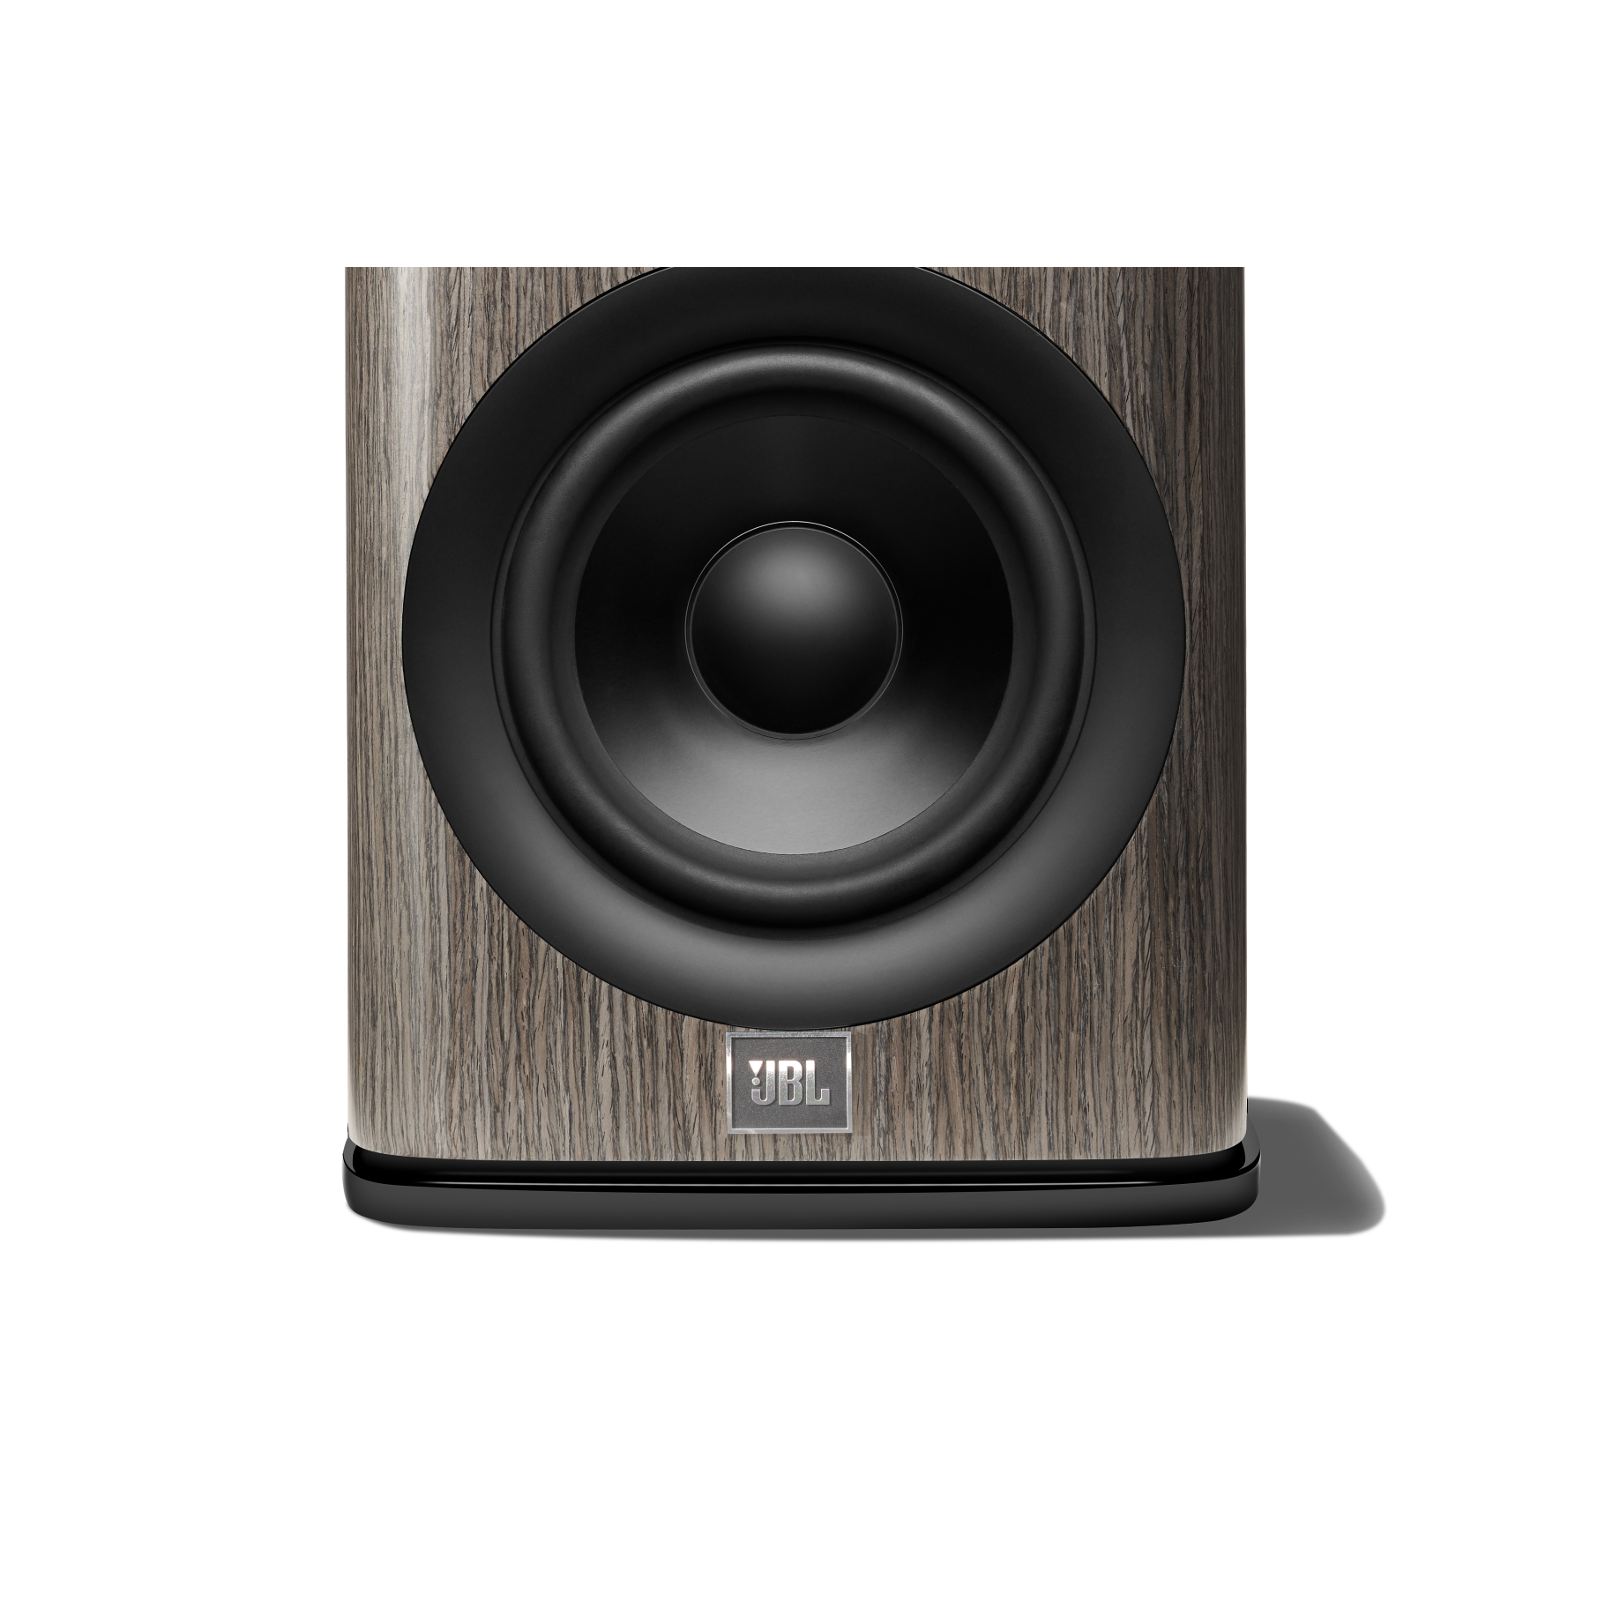 HDI-1600 - Grey Oak - 2-way 6.5-inch (165mm) Bookshelf Loudspeaker - Detailshot 1